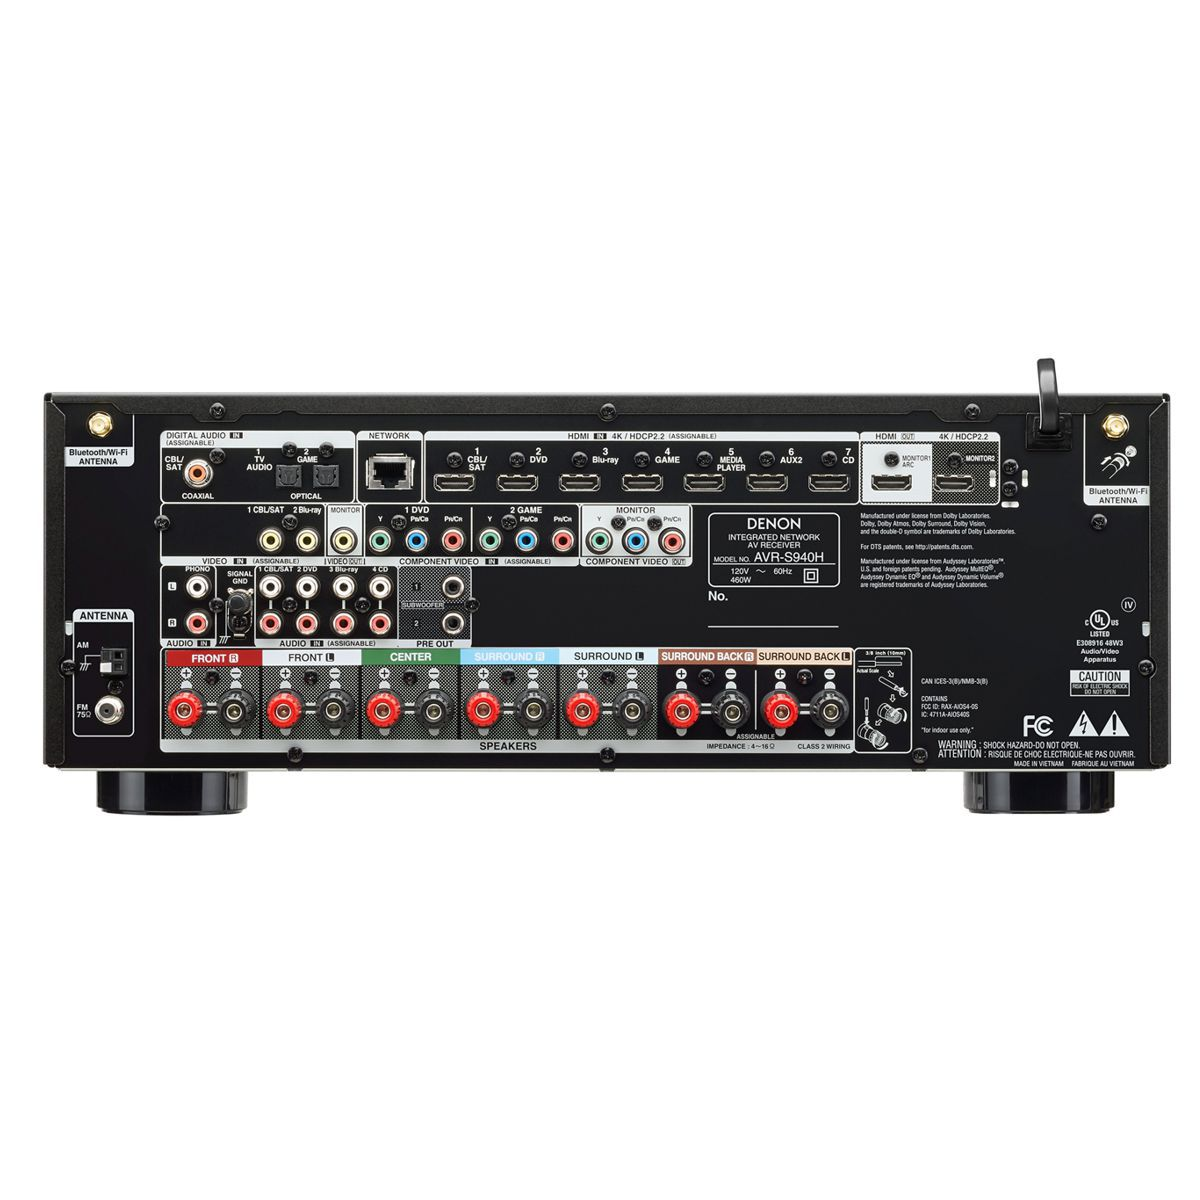 Receiver Digital 7.2 Dolby Atmos 4K UHD HDR Bluetooth USB Wi-FI AVR-S940H Denon